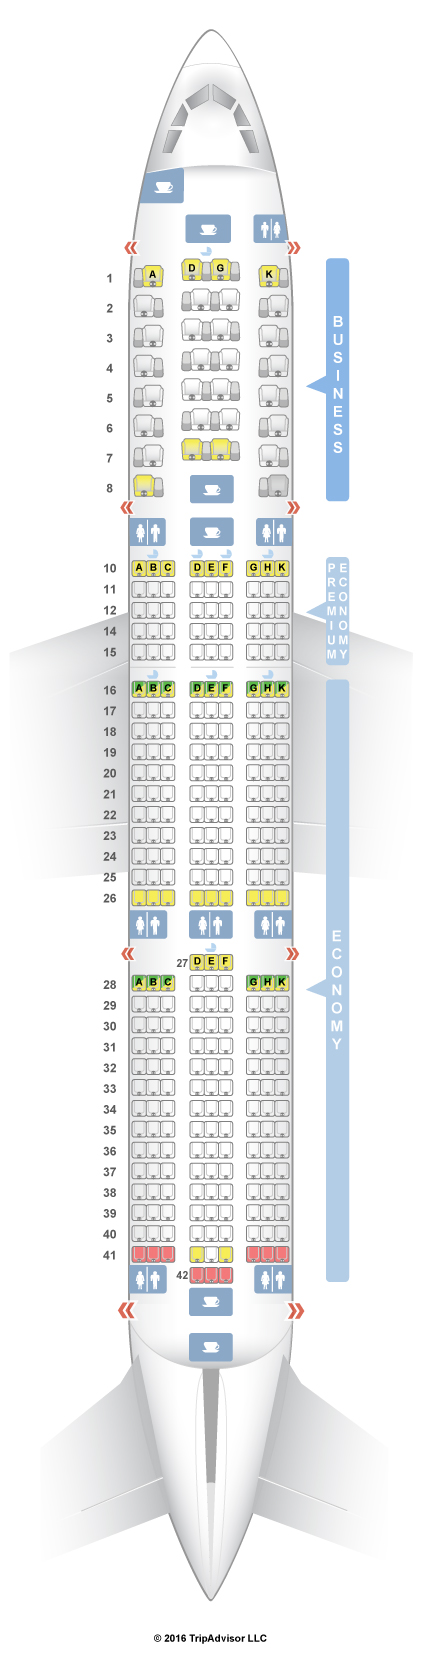 SeatGuru Seat Map Vietnam Airlines Airbus A350-900 (350) V1